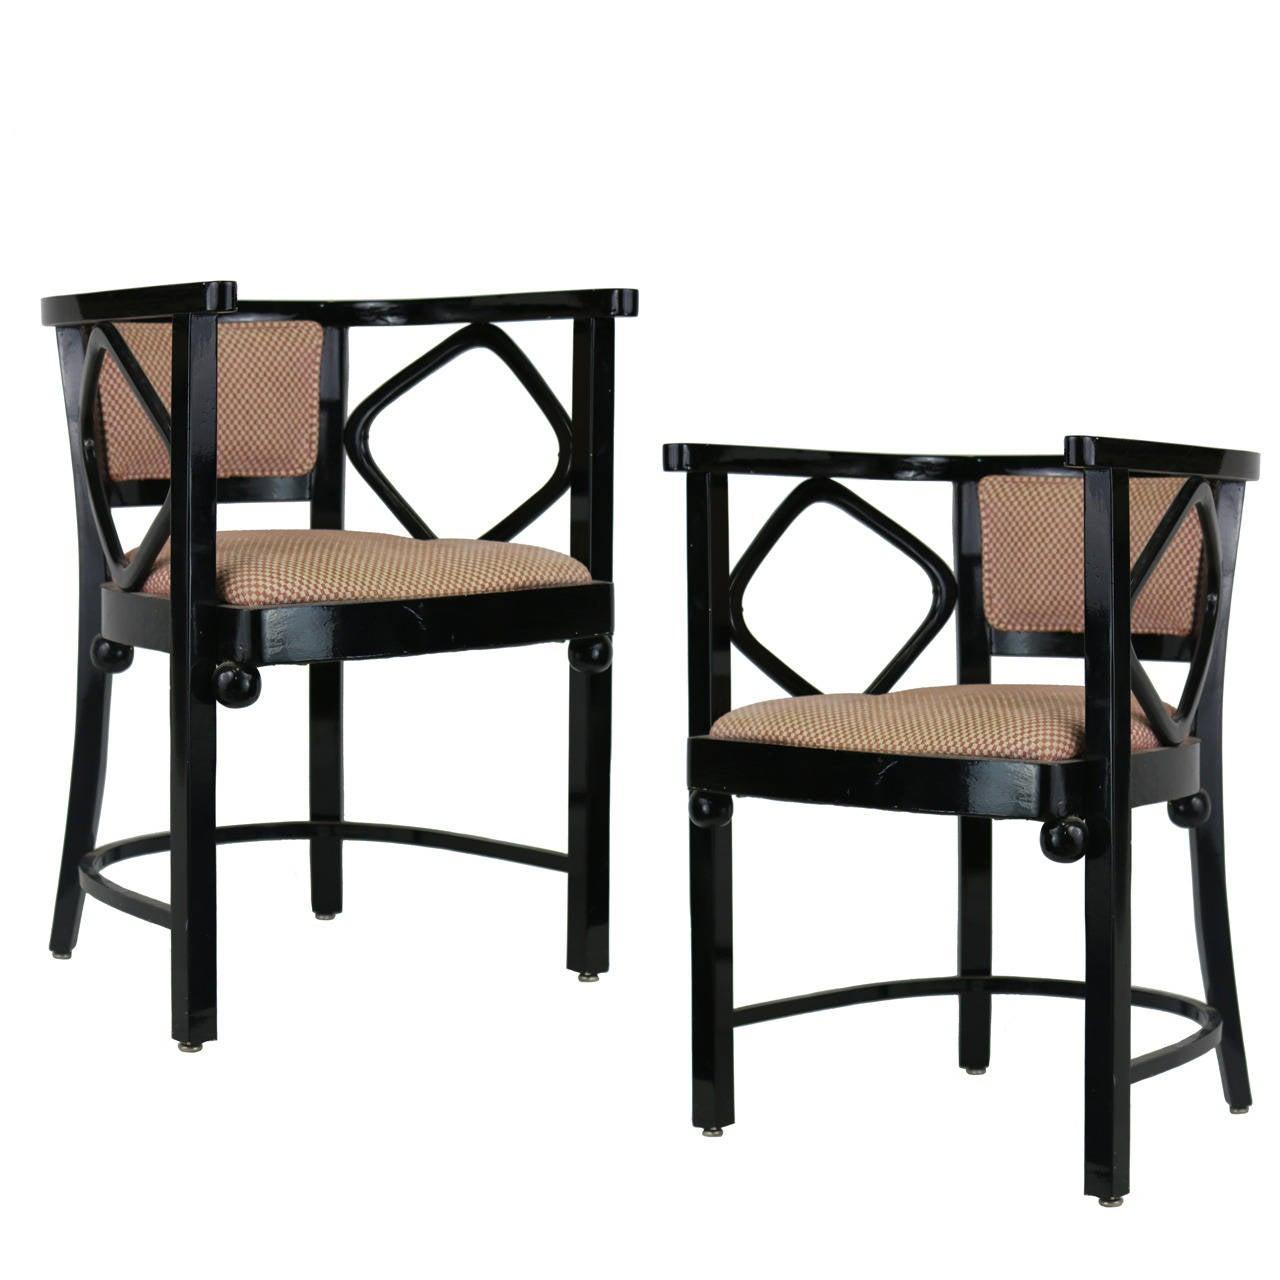 1960s Pair Of Joseph Hoffman Fledermaus Inspired Chairs 1